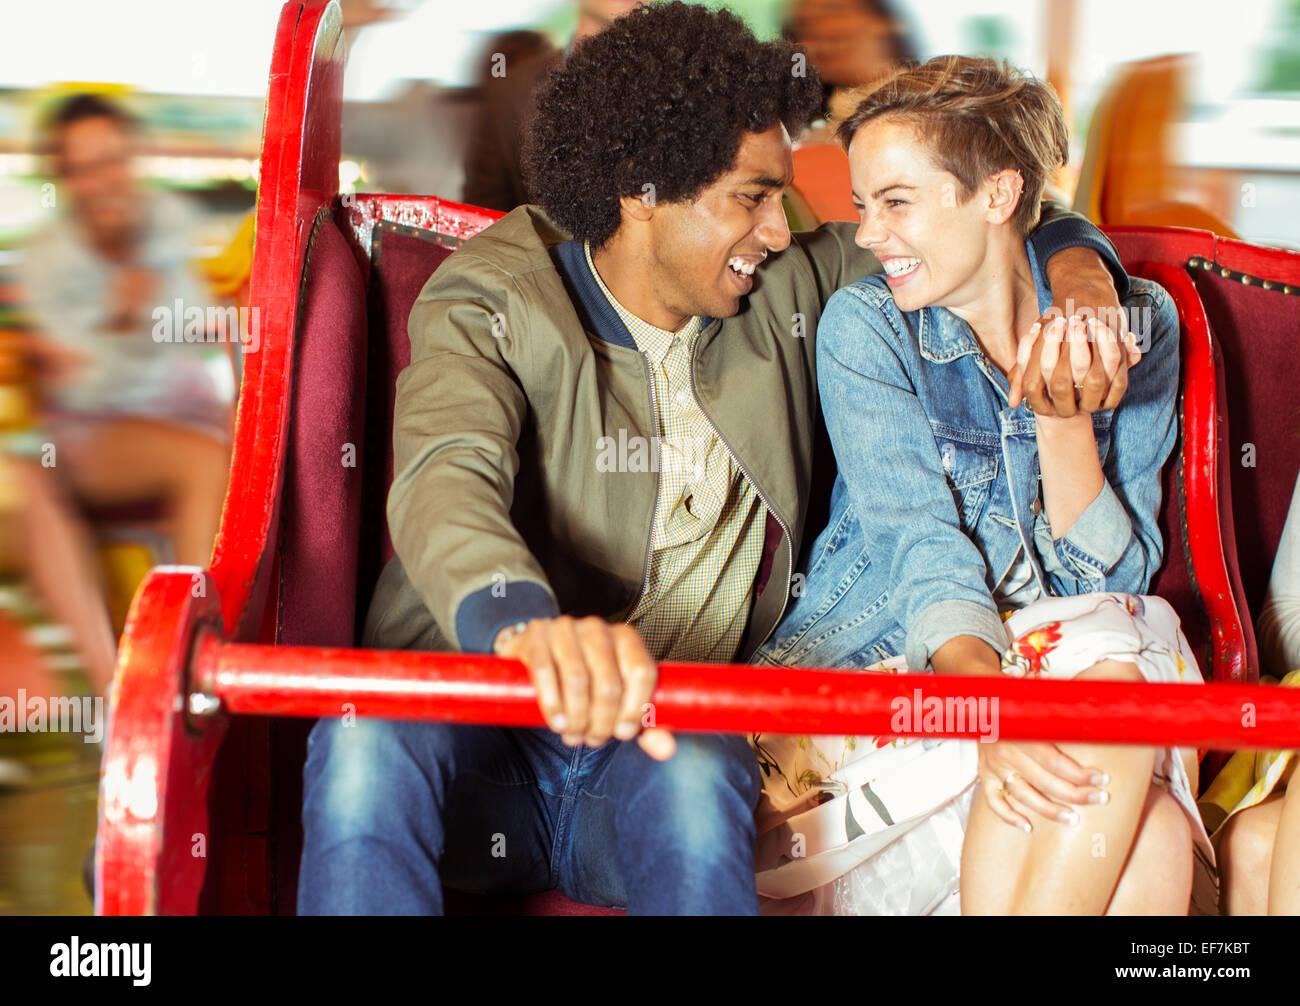 Cheerful couple on carousel in amusement park Stock Photo